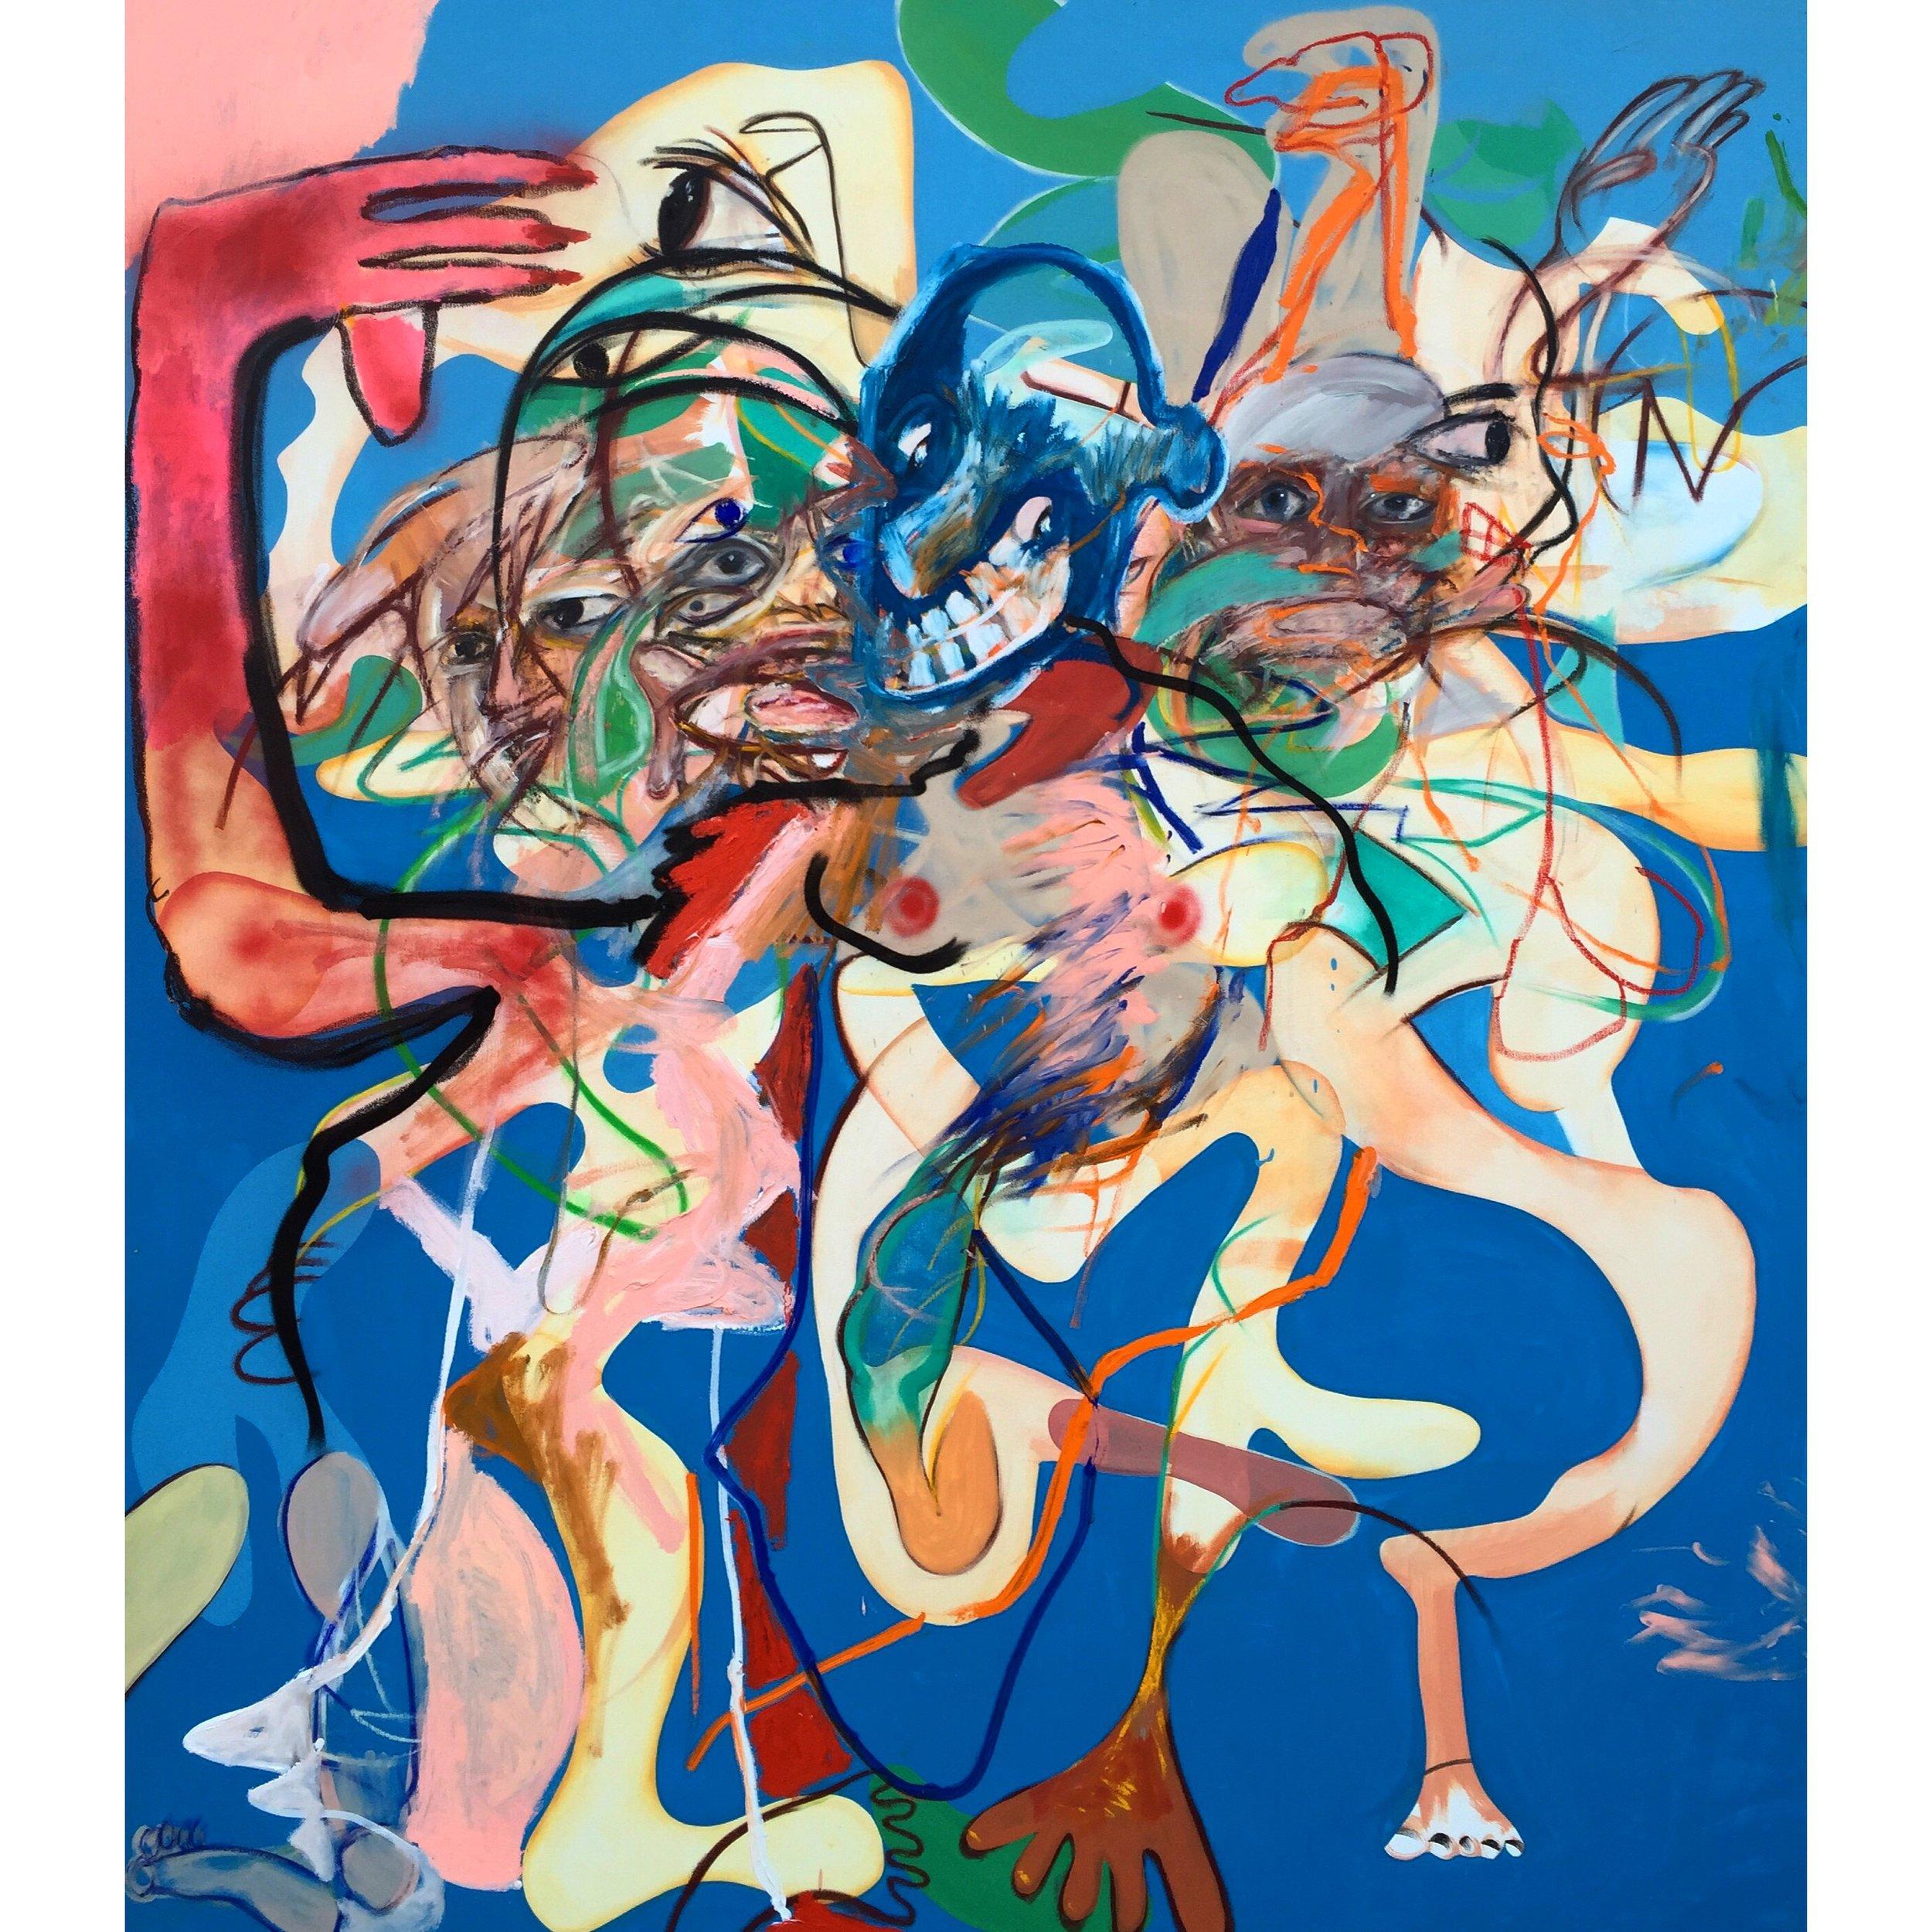 Oil, Acrylic, and Spray Paint on Canvas  77 x 68 in  197 x 172 cm